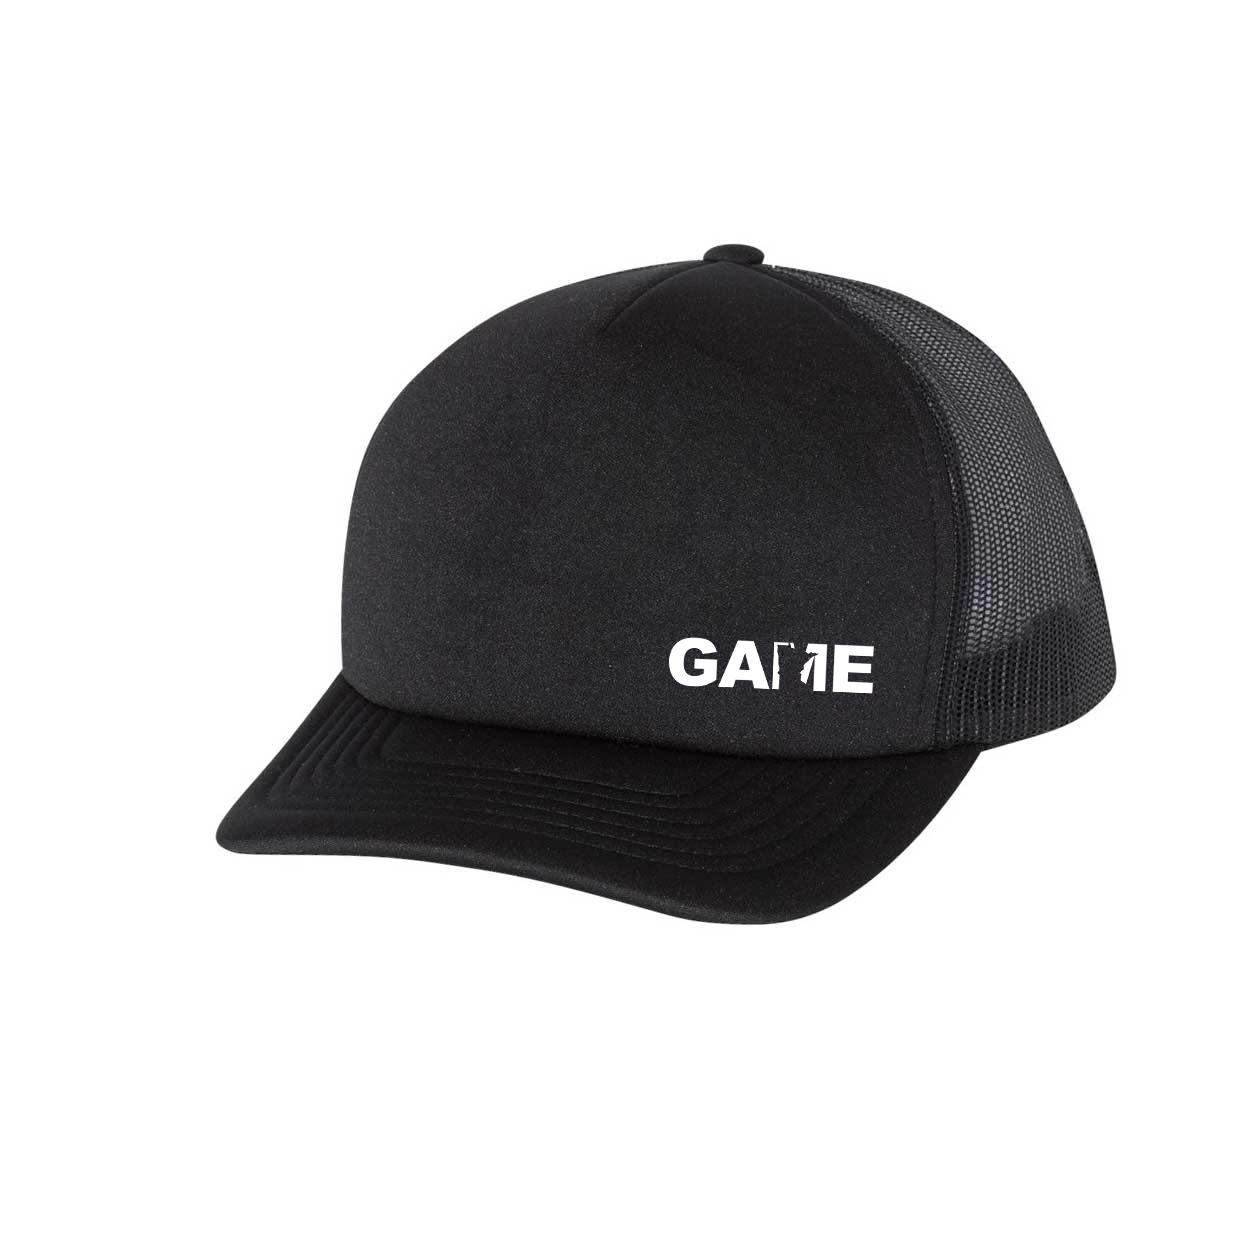 Game Minnesota Night Out Premium Foam Trucker Snapback Hat Black (White Logo)